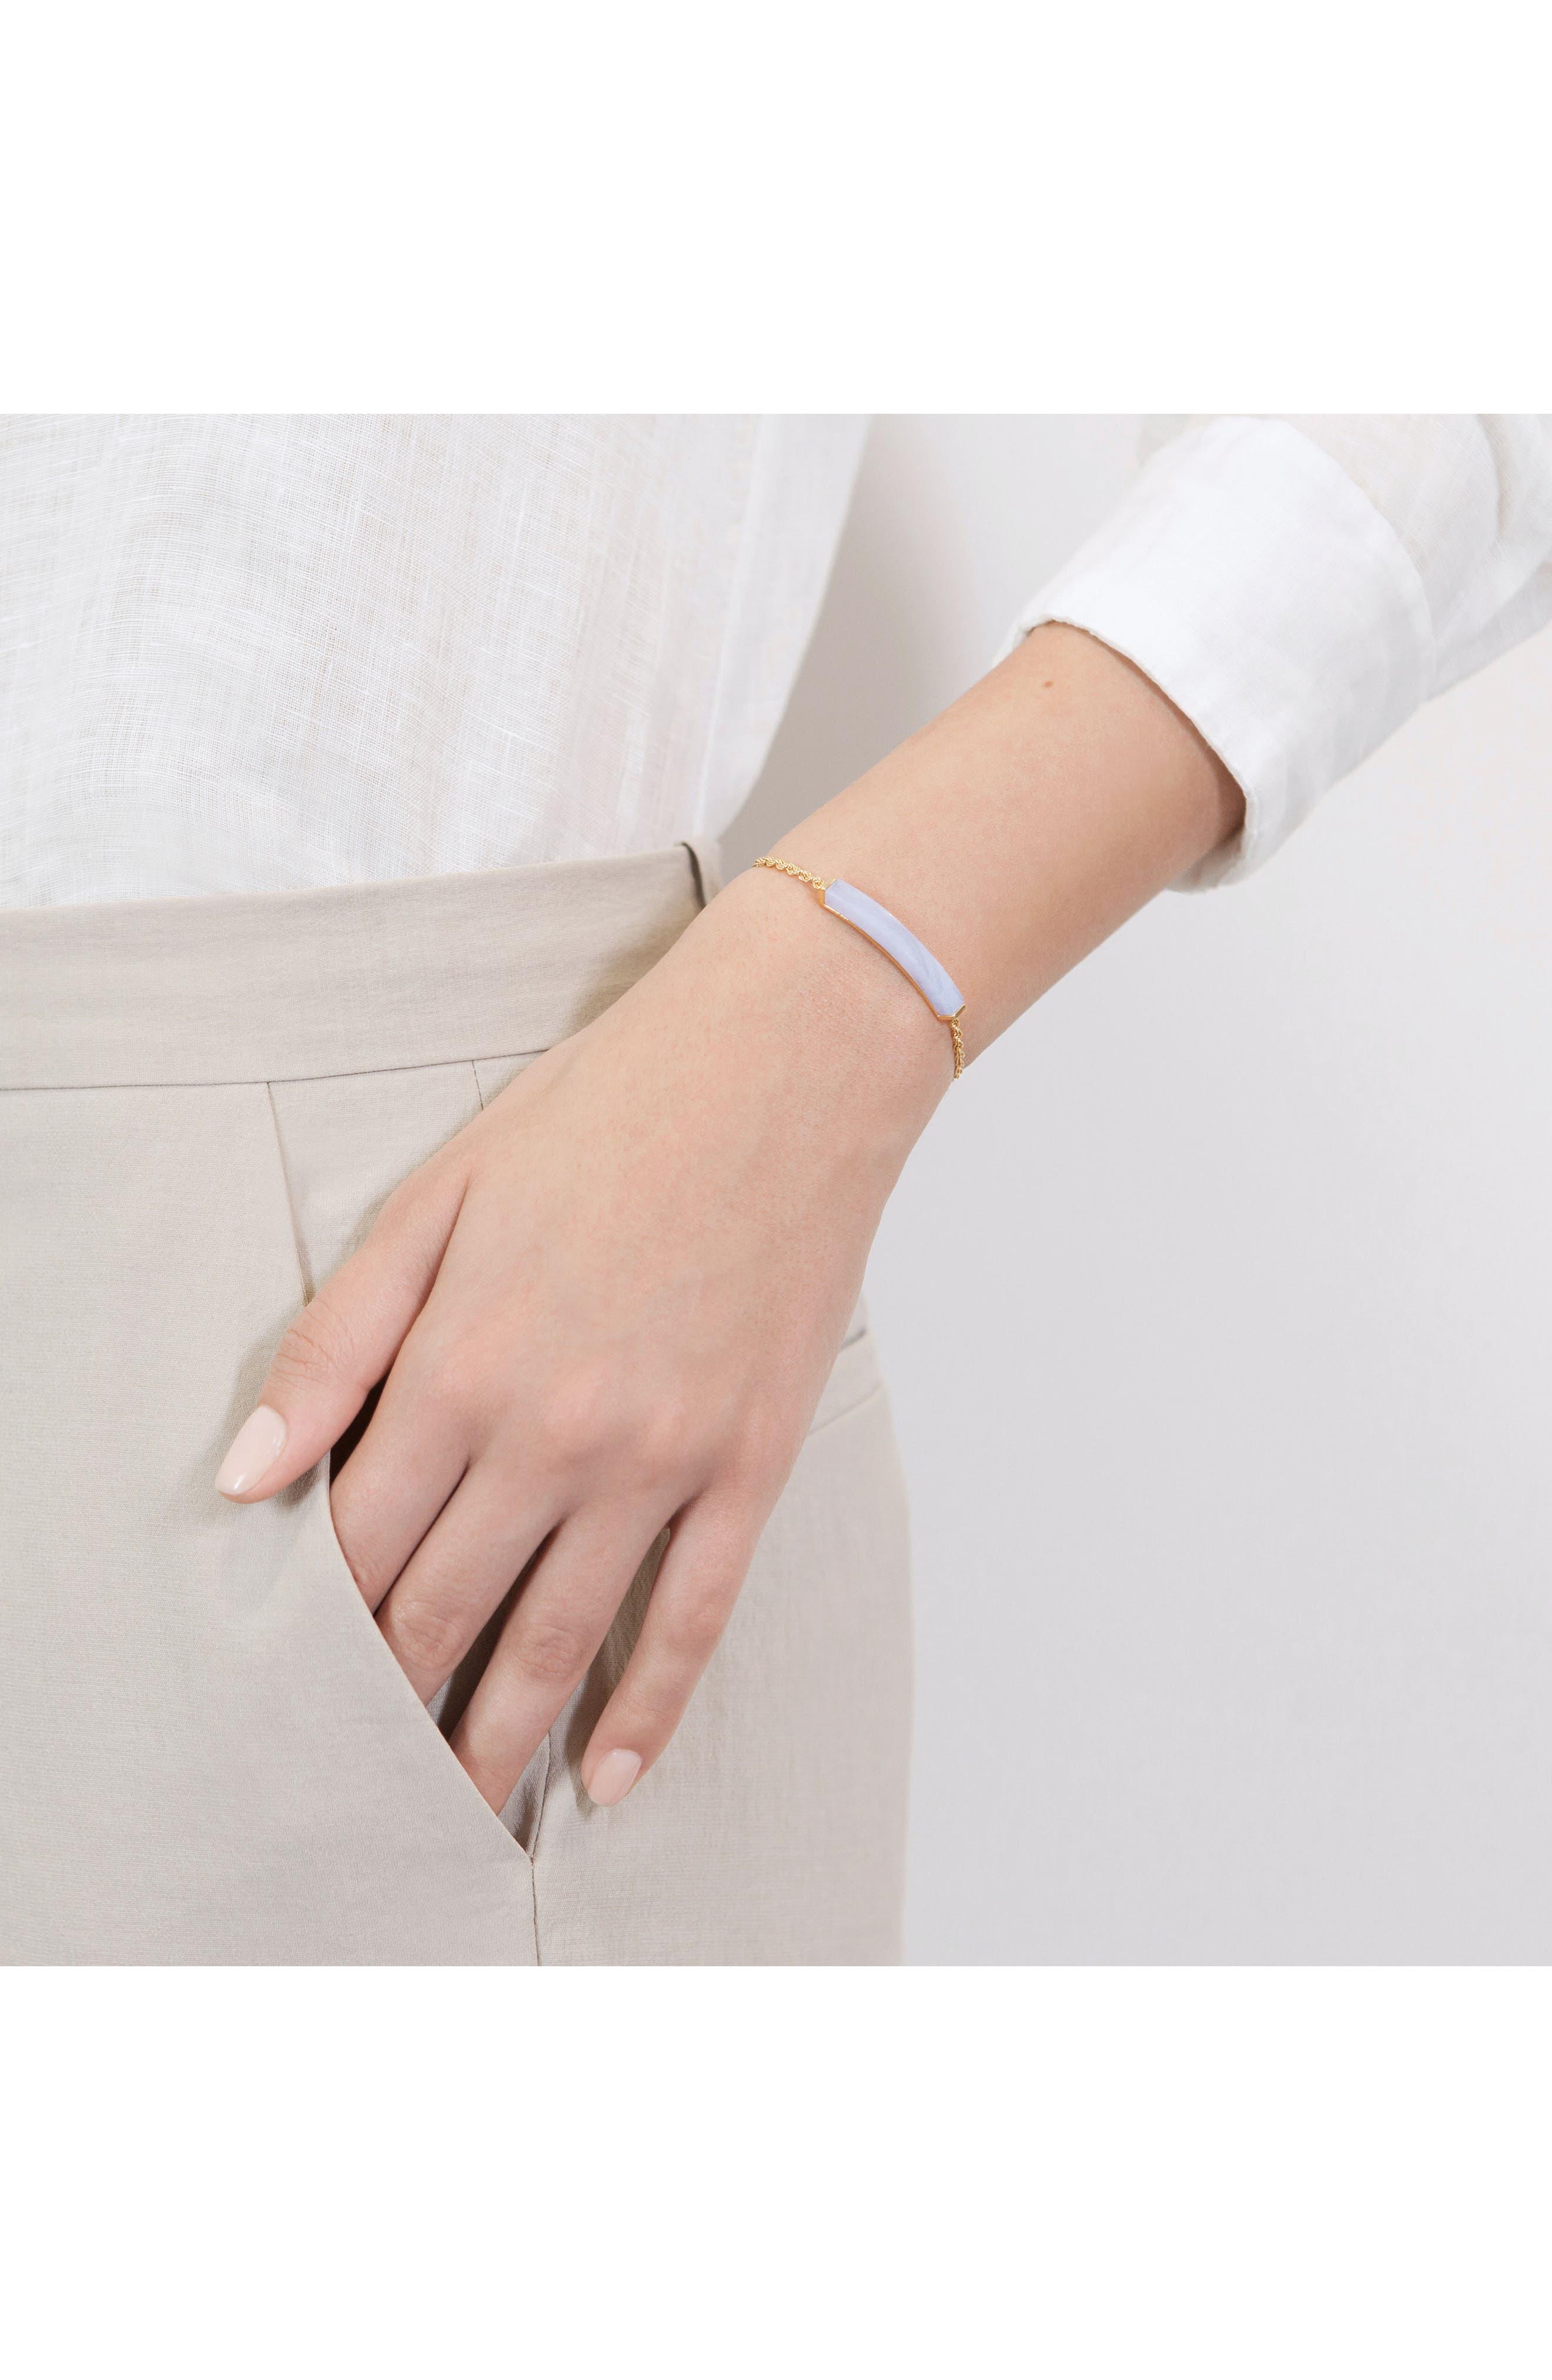 Linear Semiprecious Stone Friendship Bracelet,                             Alternate thumbnail 2, color,                             GOLD/ BLUE LACE AGATE